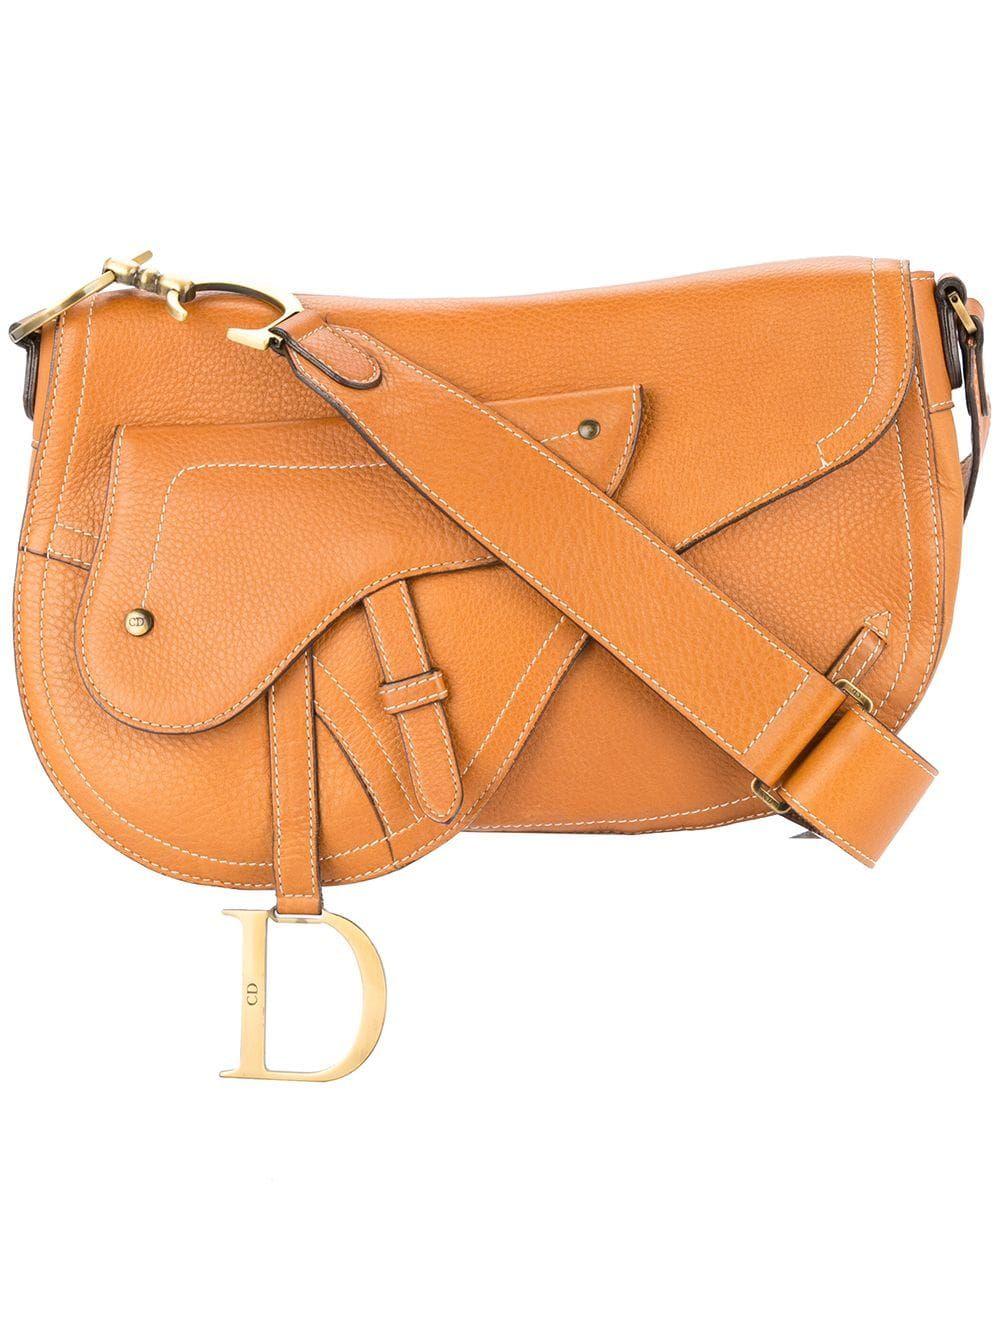 1930a8998 CHRISTIAN DIOR PRE-OWNED saddle shoulder bag - Brown in 2019 ...